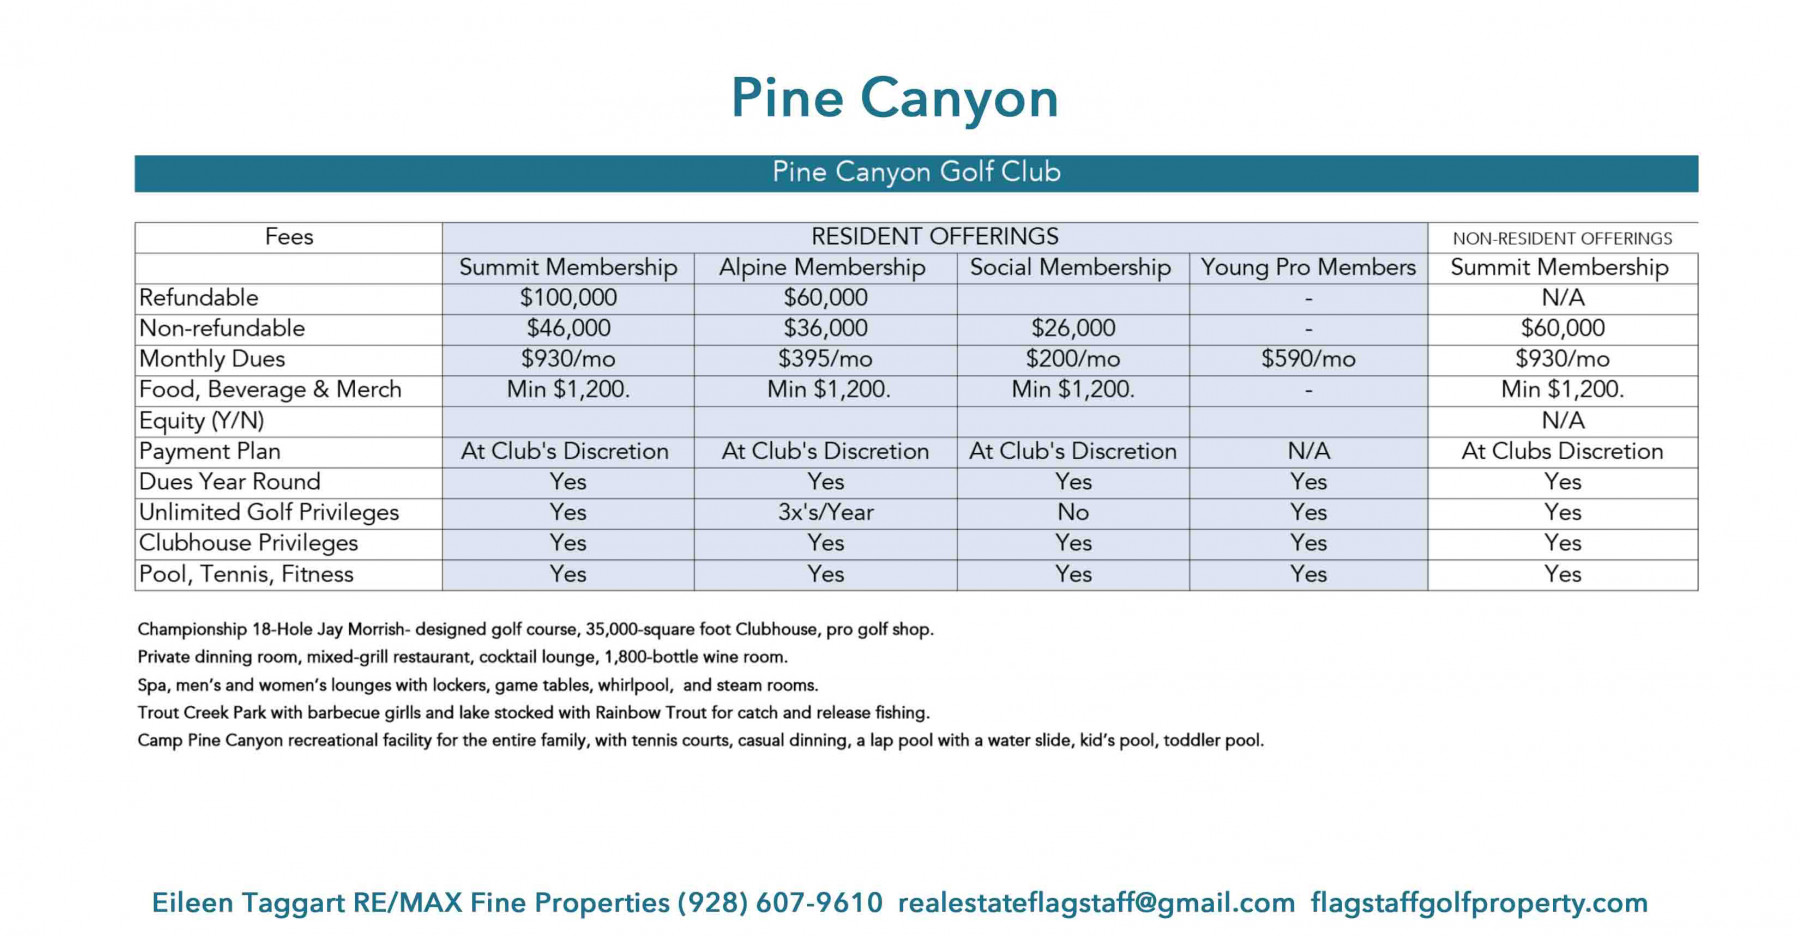 Pine Canyon Card